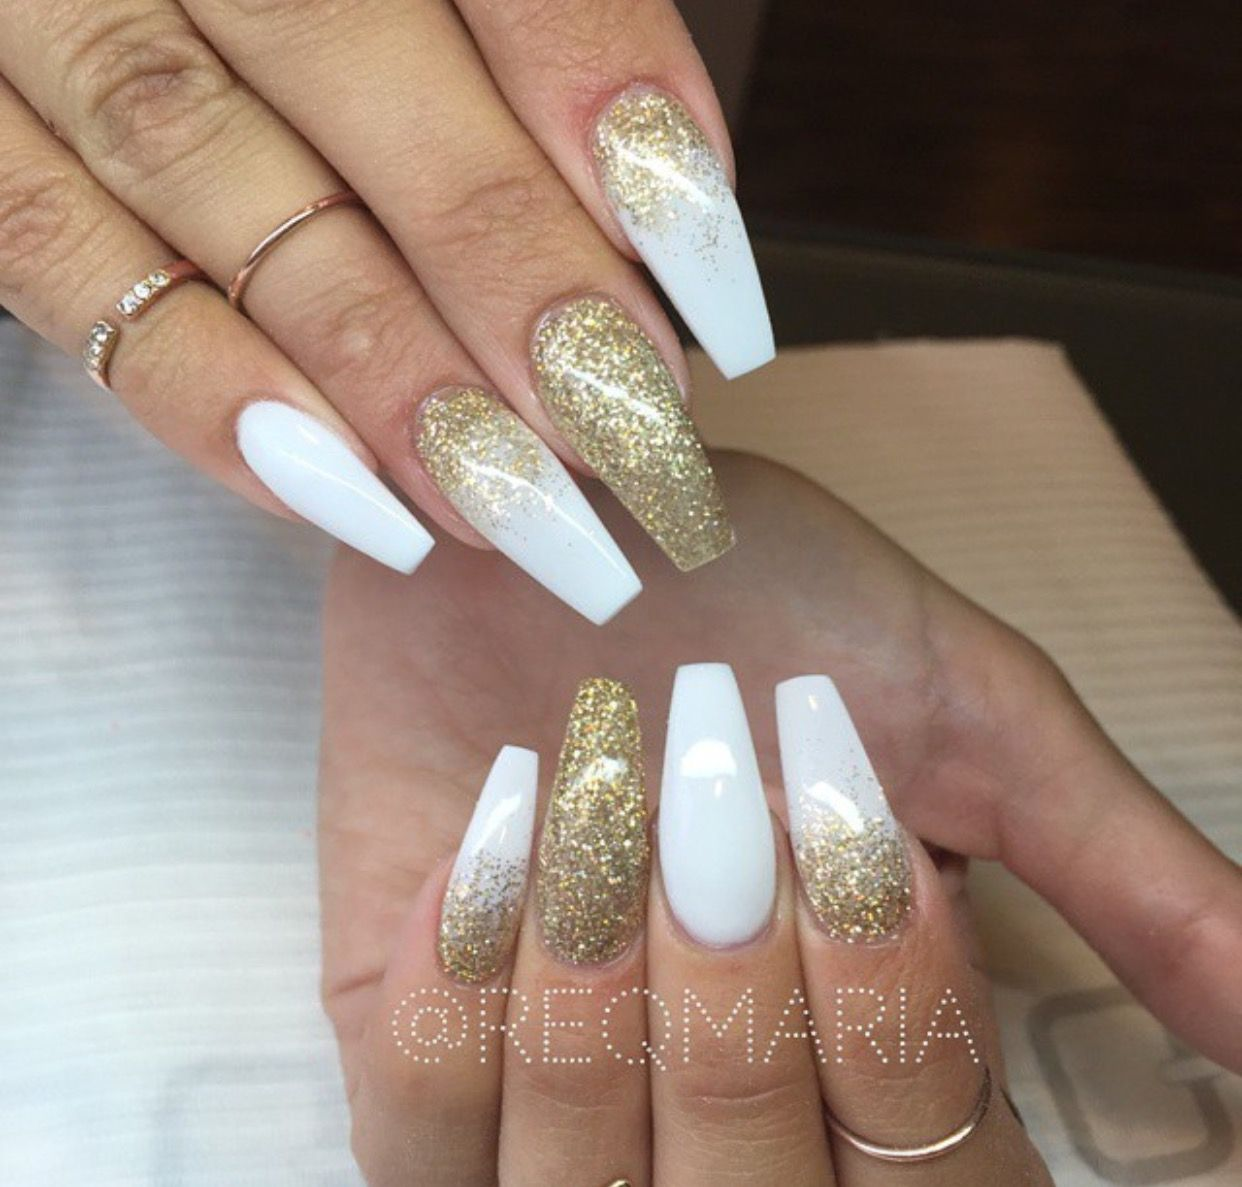 new years nails, white, gold, glitter | Nail Designs | Pinterest ...